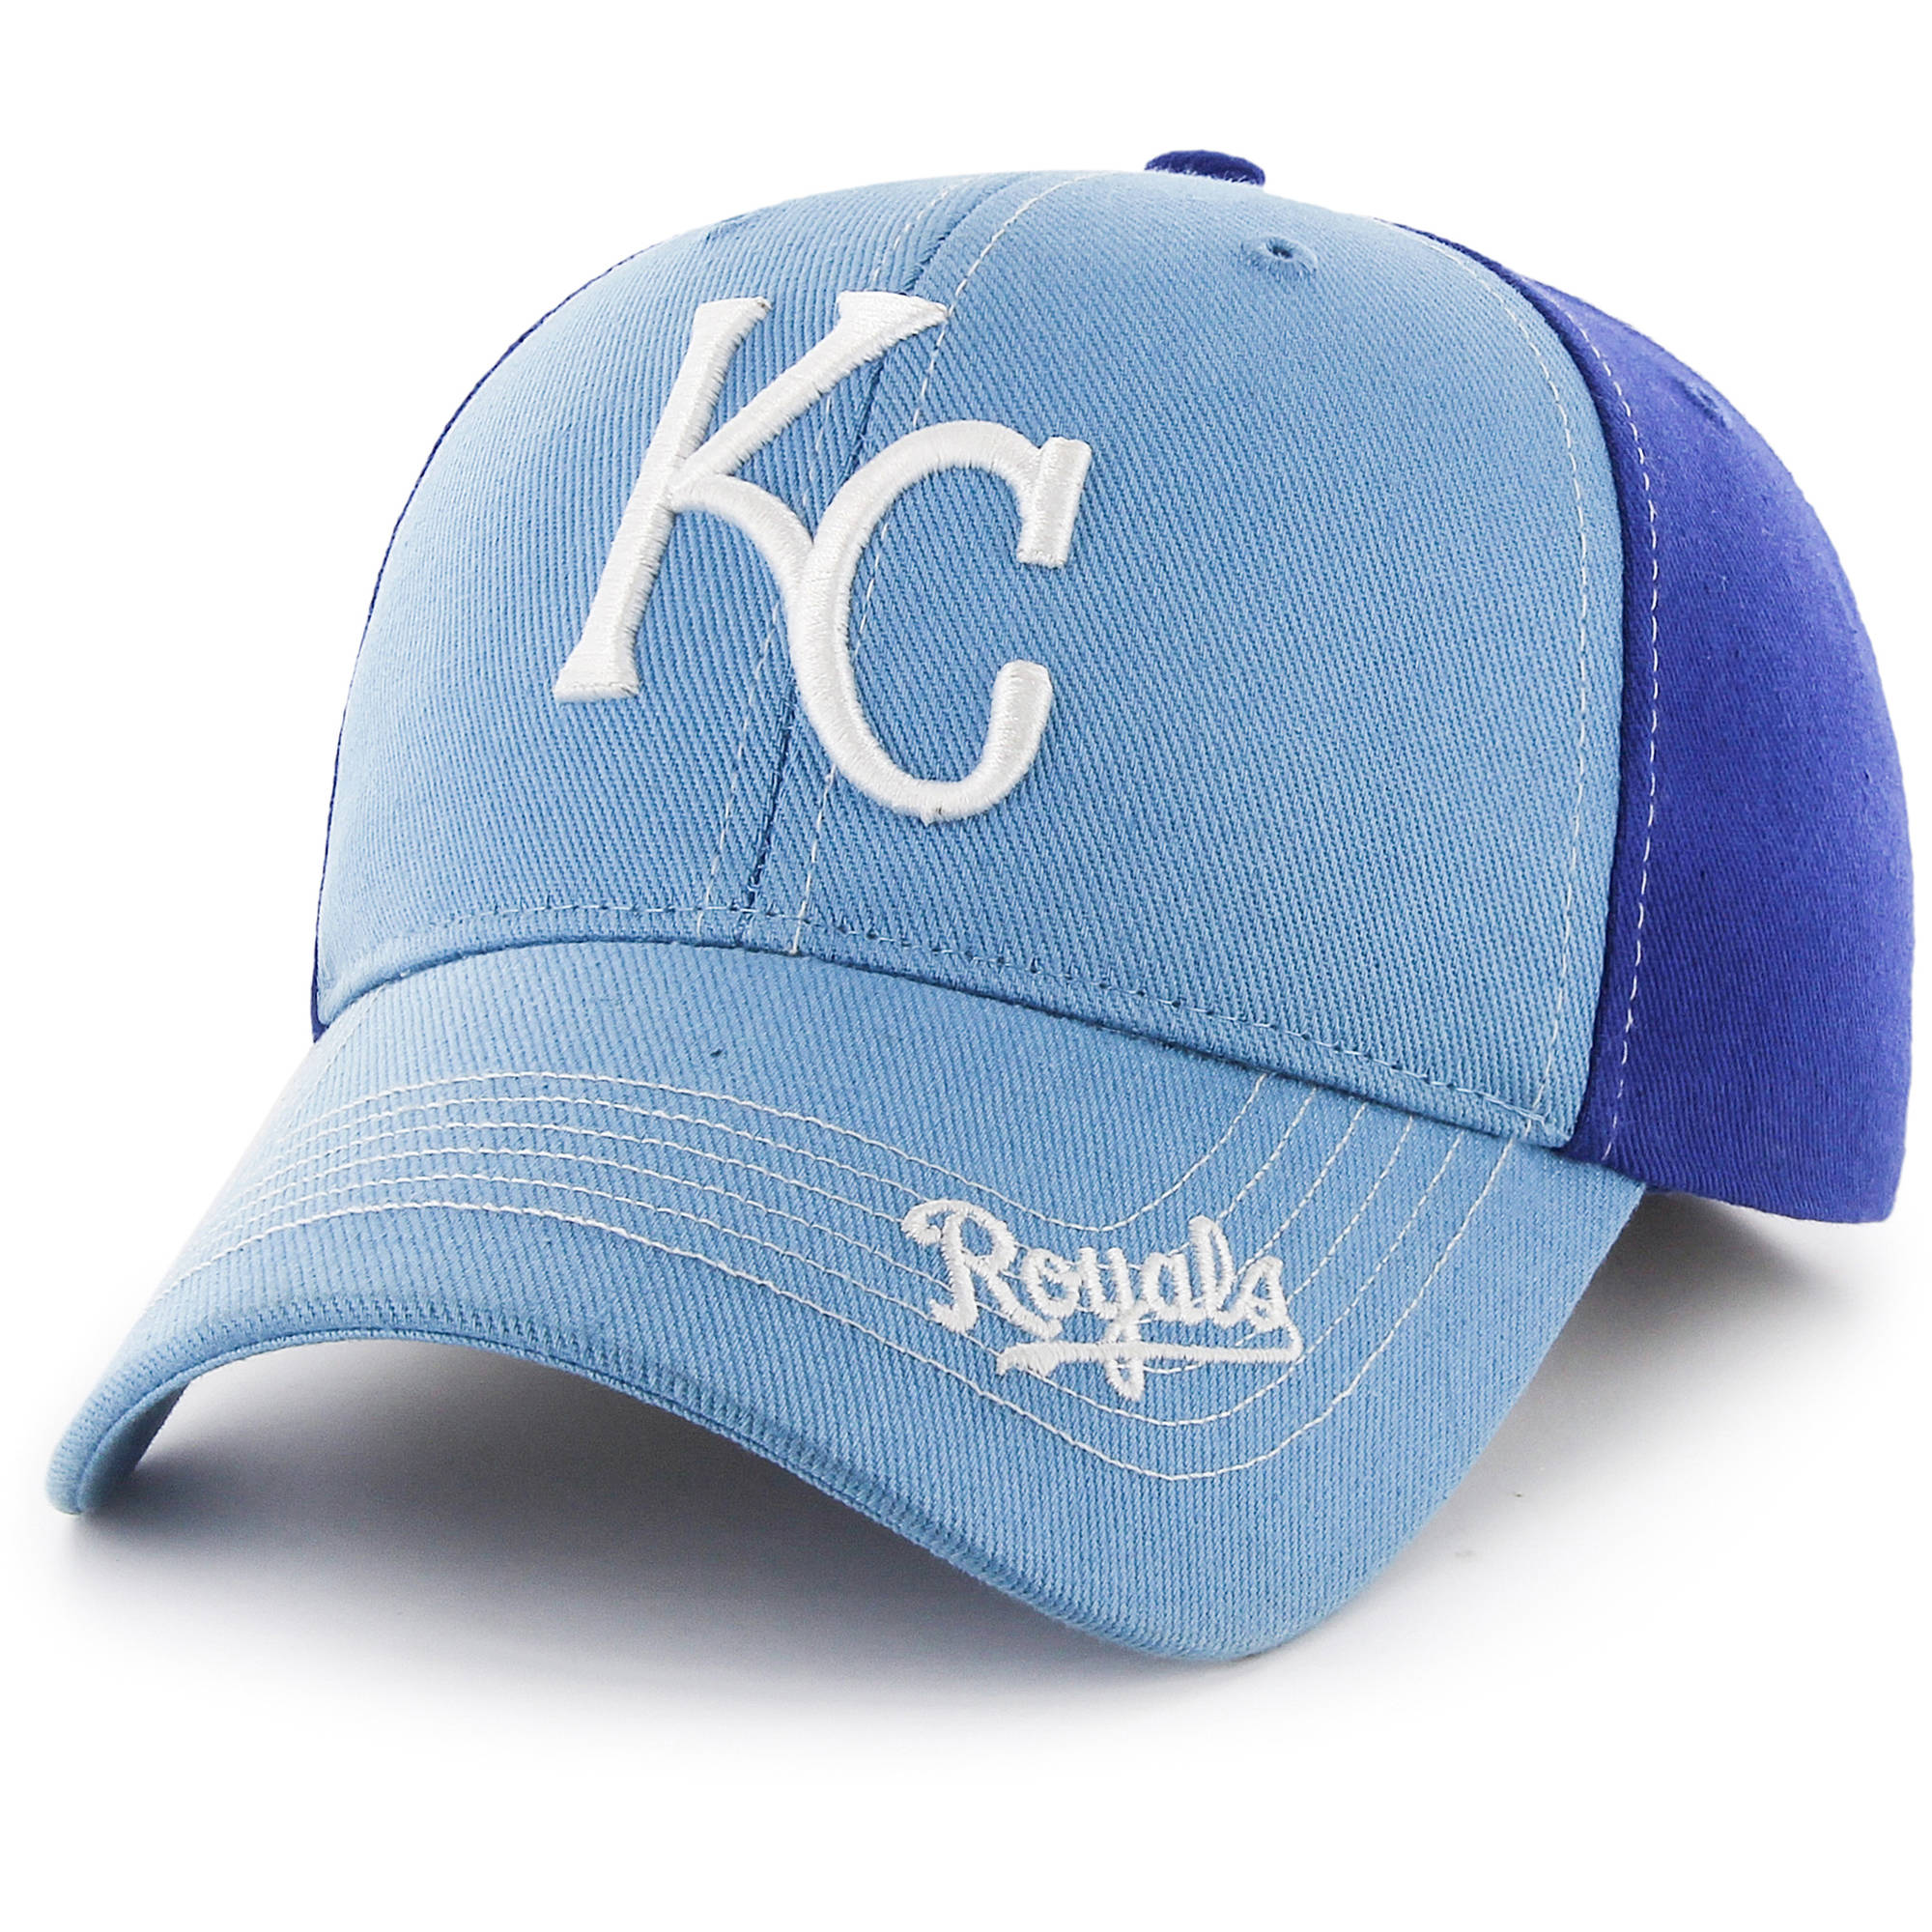 MLB Kansas City Royals Revolver Cap / Hat by Fan Favorite